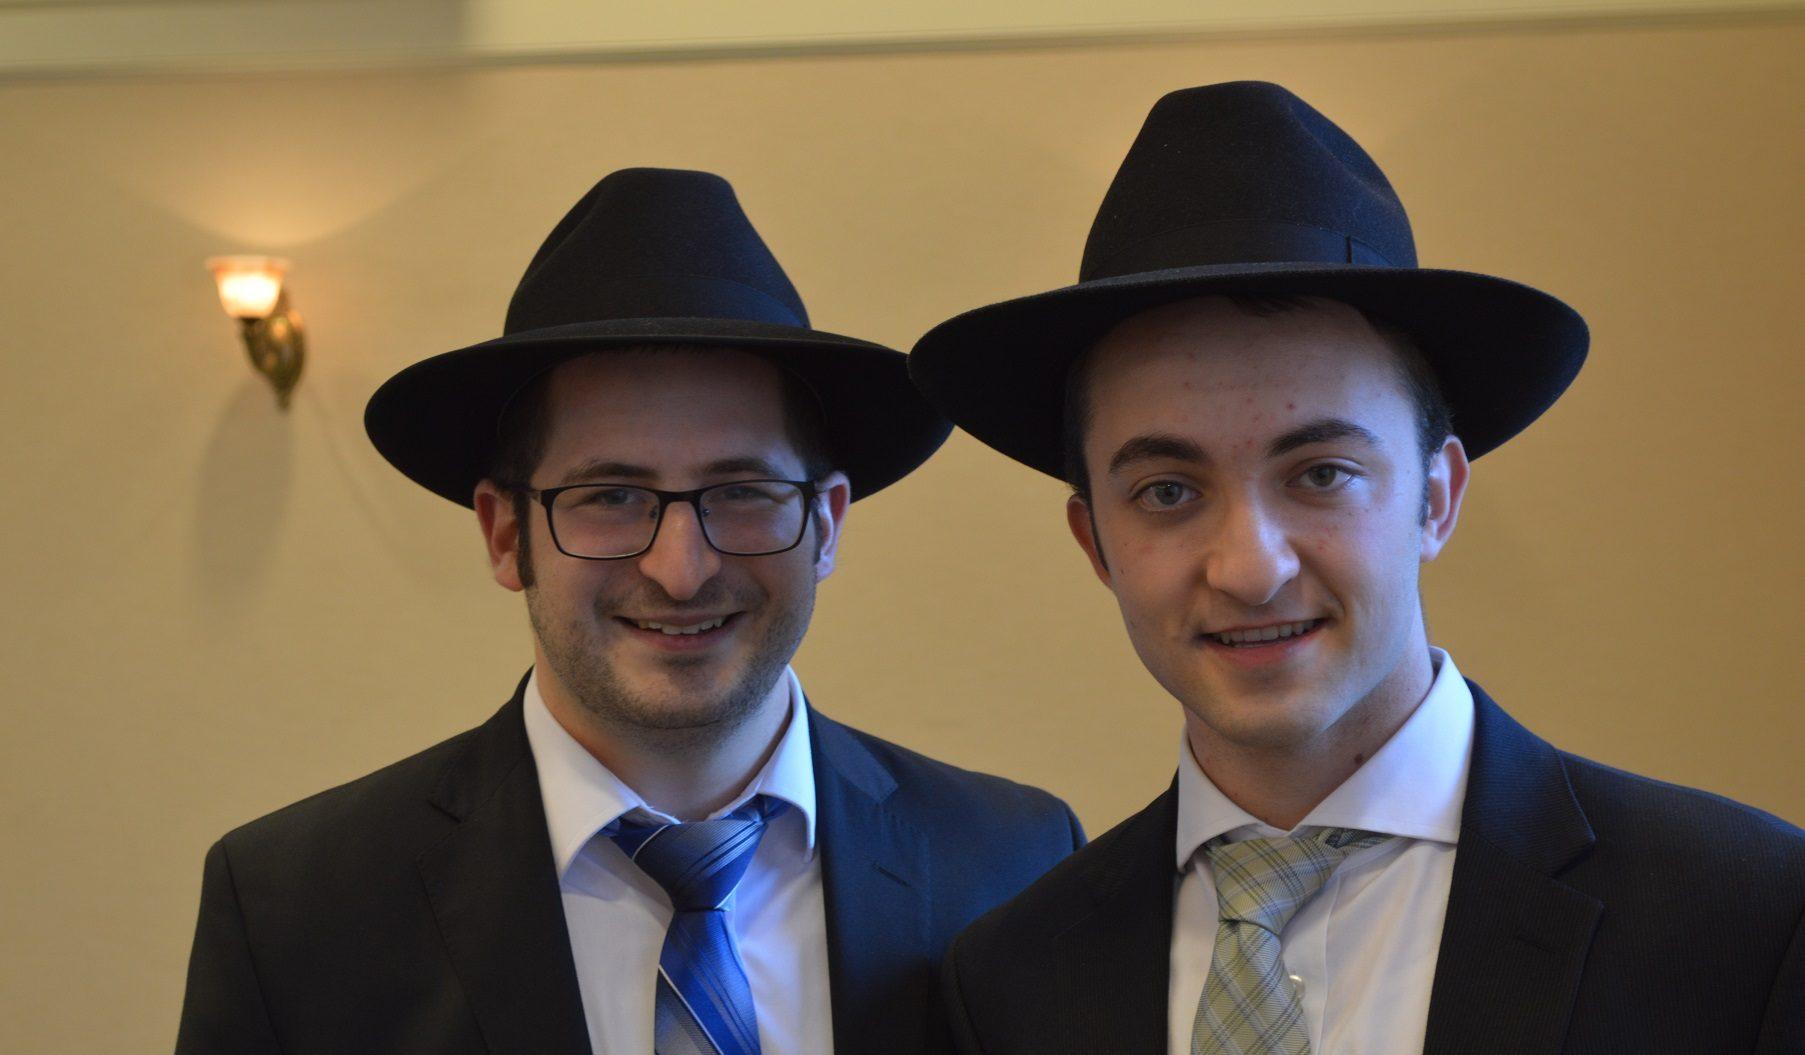 Kol Nidre unites retirees, rabbinic students in prayer